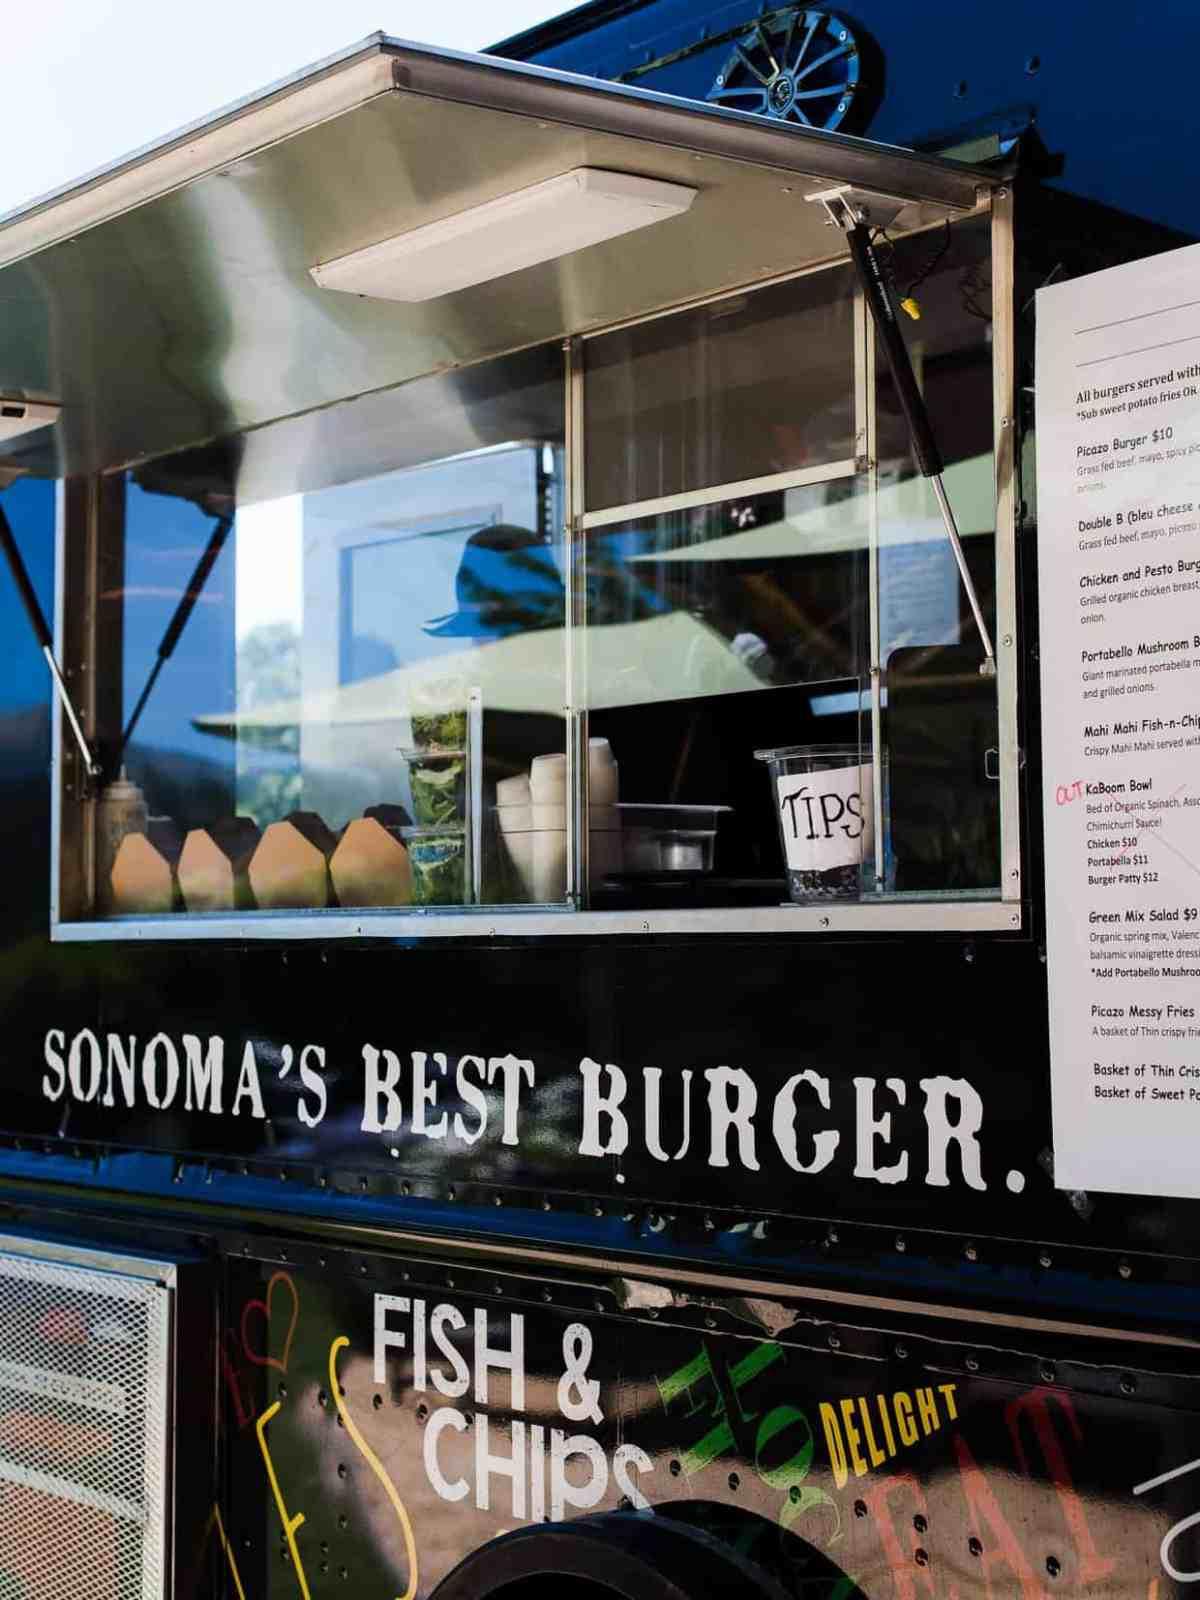 The order window of a food truck selling hamburgers.